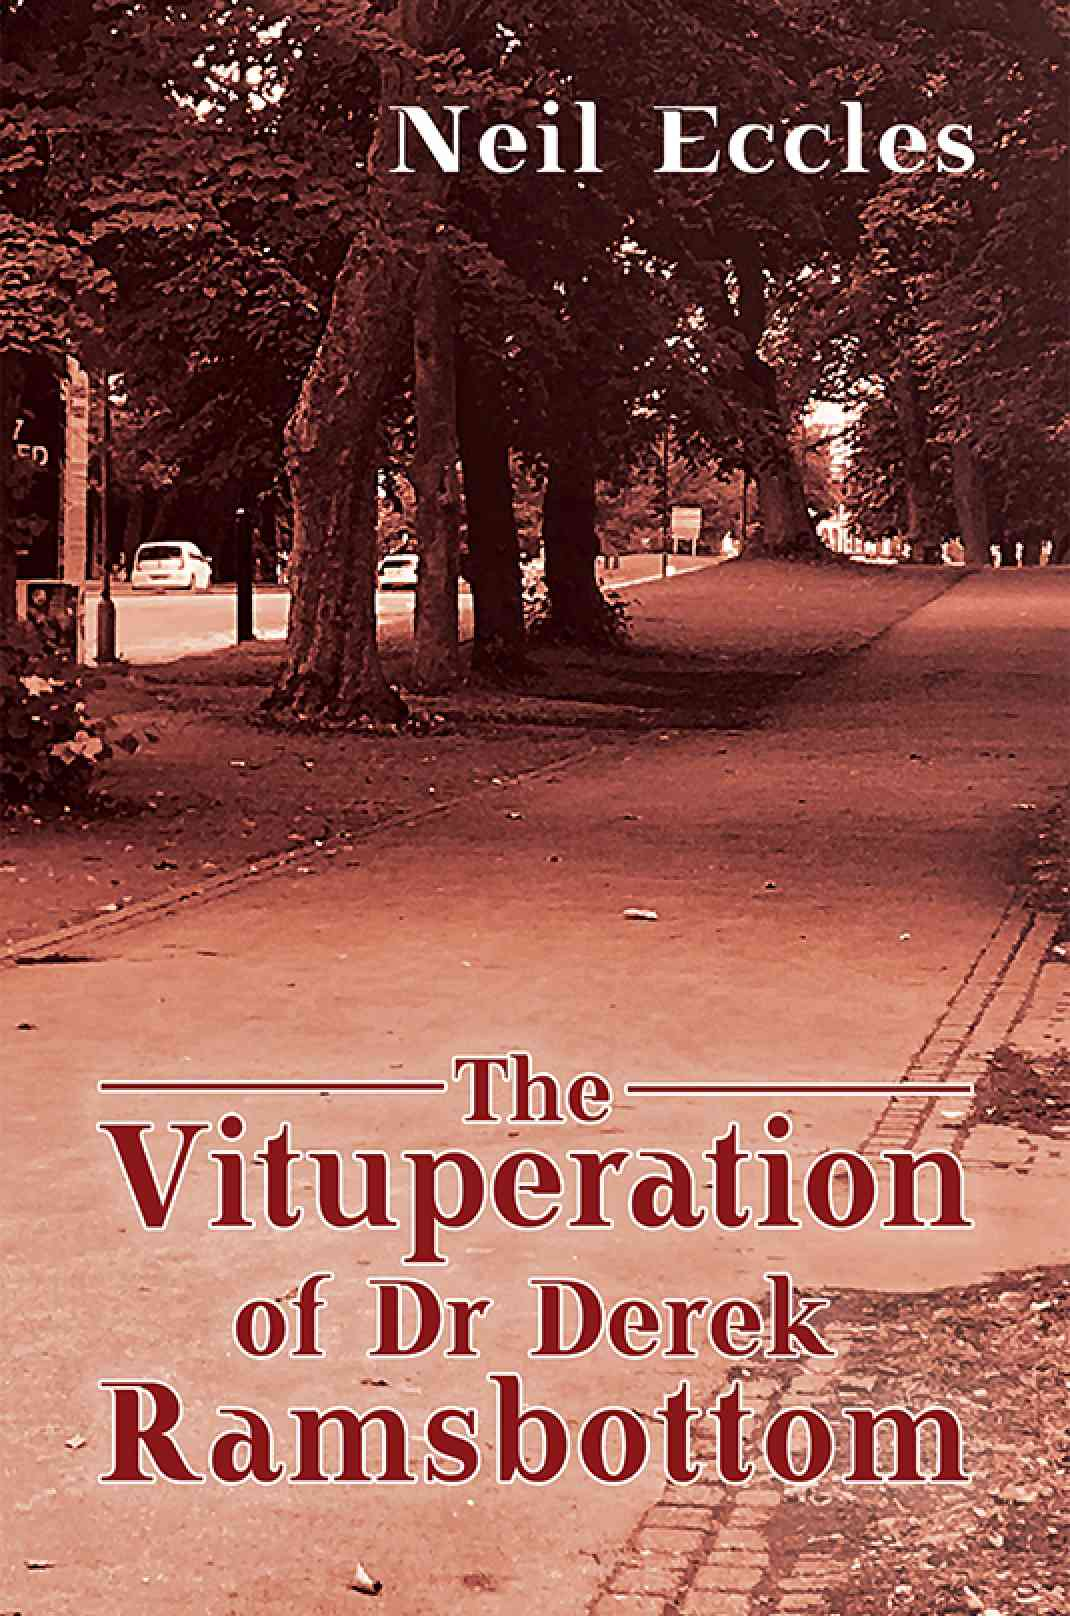 The Vituperation of Dr Derek Ramsbottom   Book  Austin Macauley